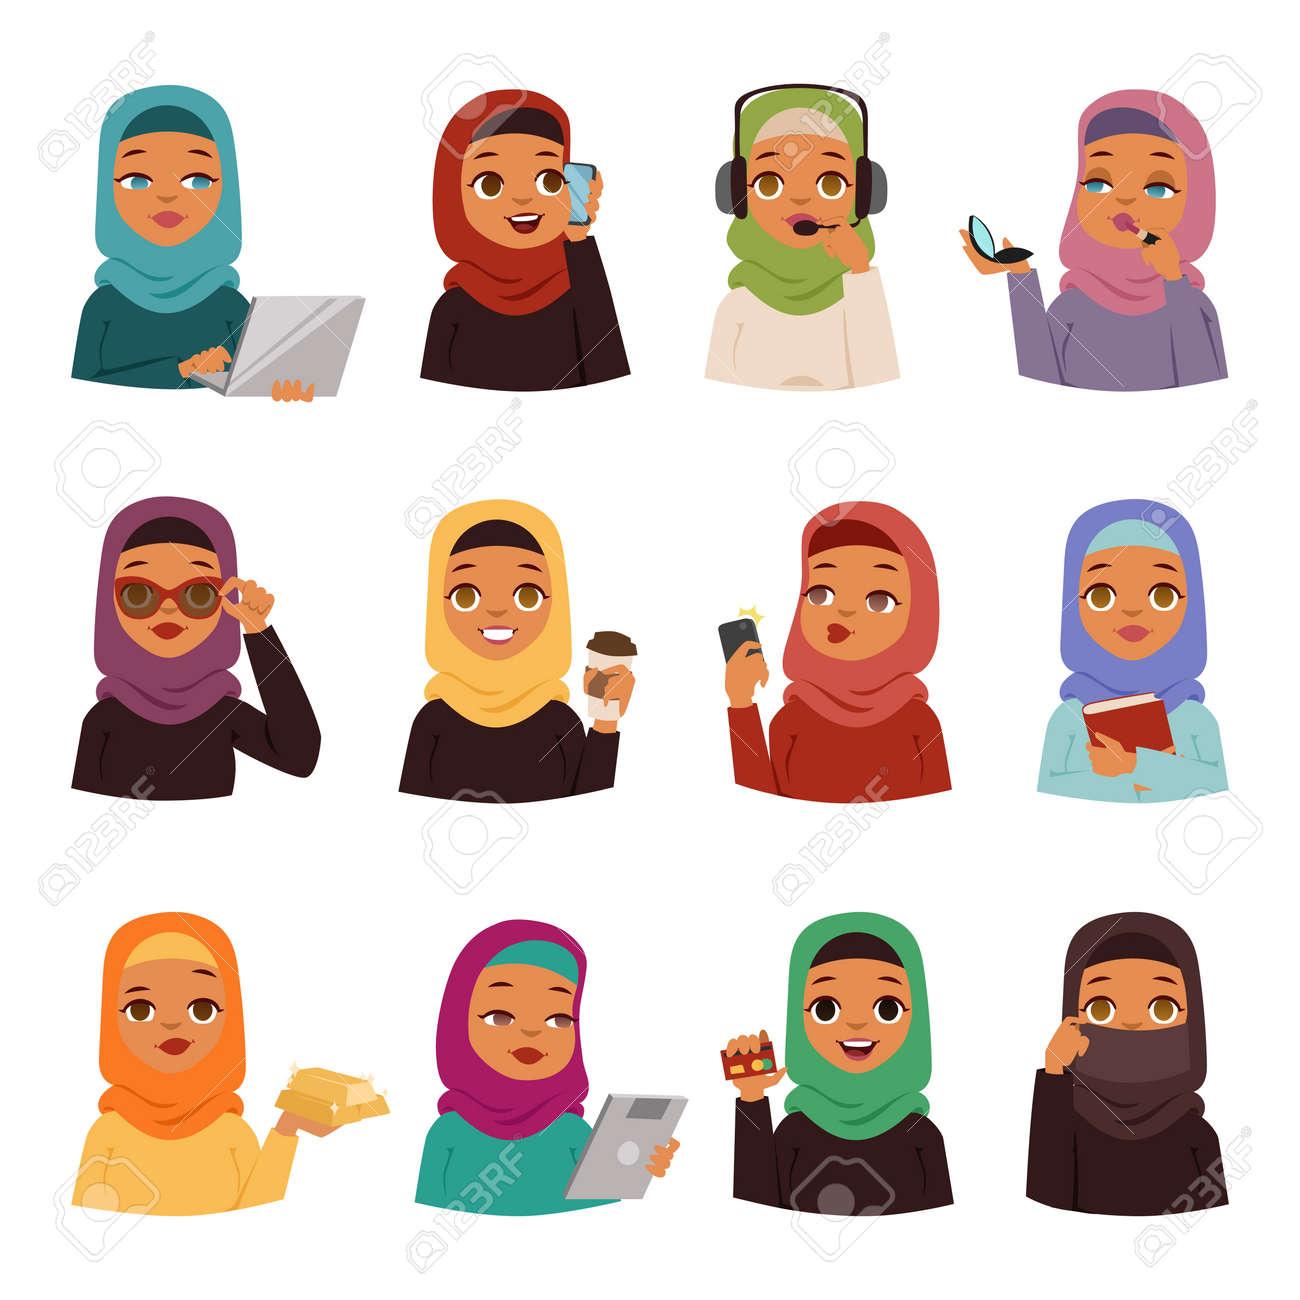 Muslim religious women set traditional islamic adult cute cartoon arabic girls traditional dress pretty ethnicity